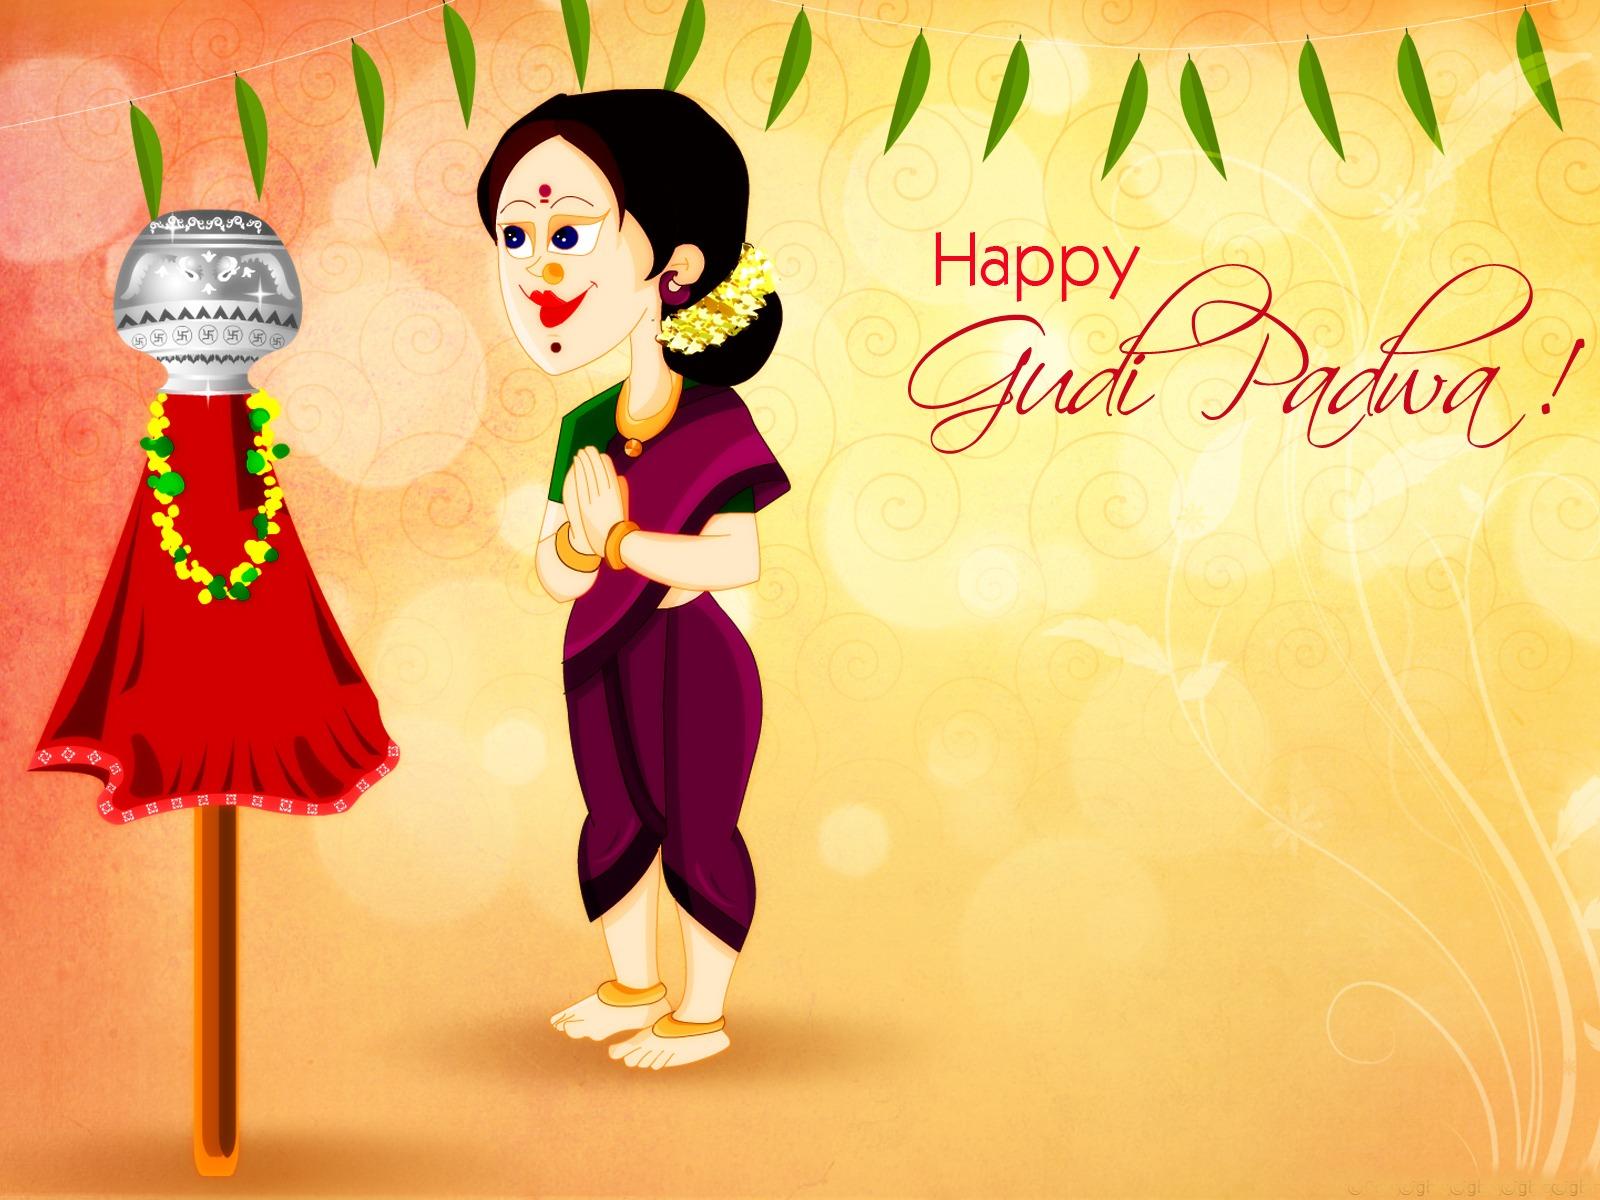 32 Gudi Padwa Captions English & Marathi!